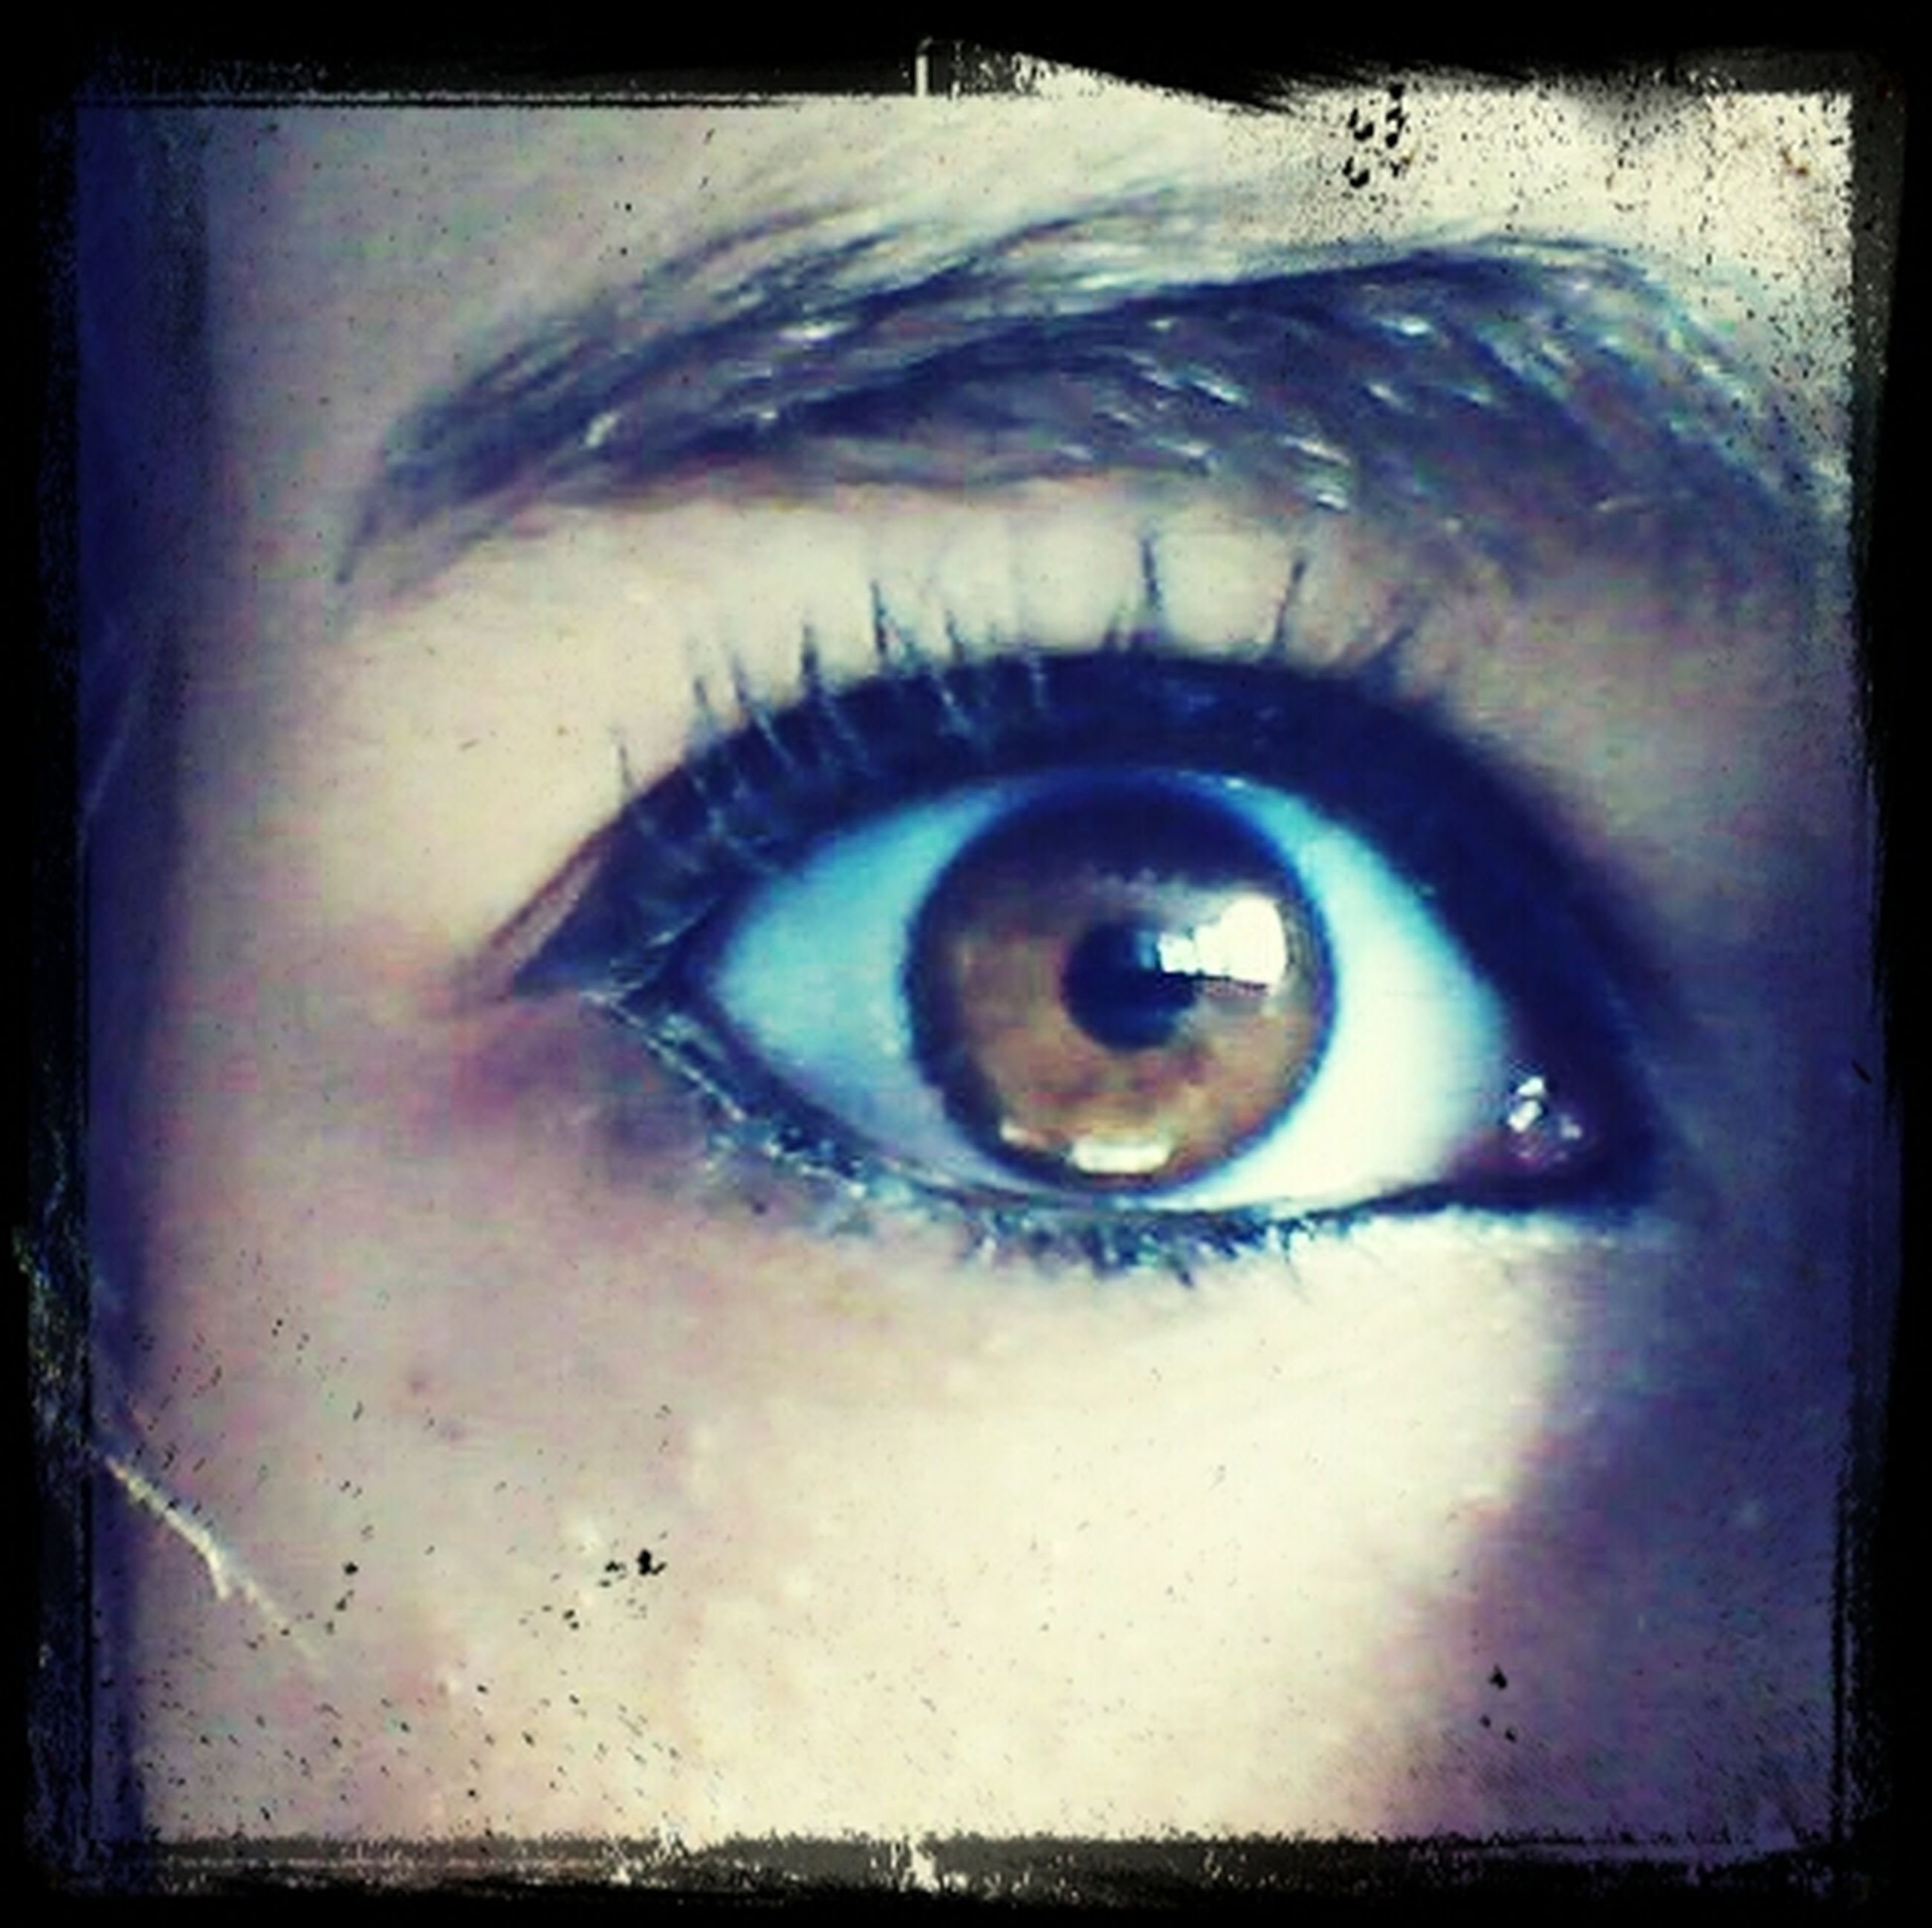 human eye, close-up, transfer print, portrait, looking at camera, eyelash, eyesight, auto post production filter, indoors, sensory perception, human face, part of, lifestyles, iris - eye, extreme close-up, headshot, eyeball